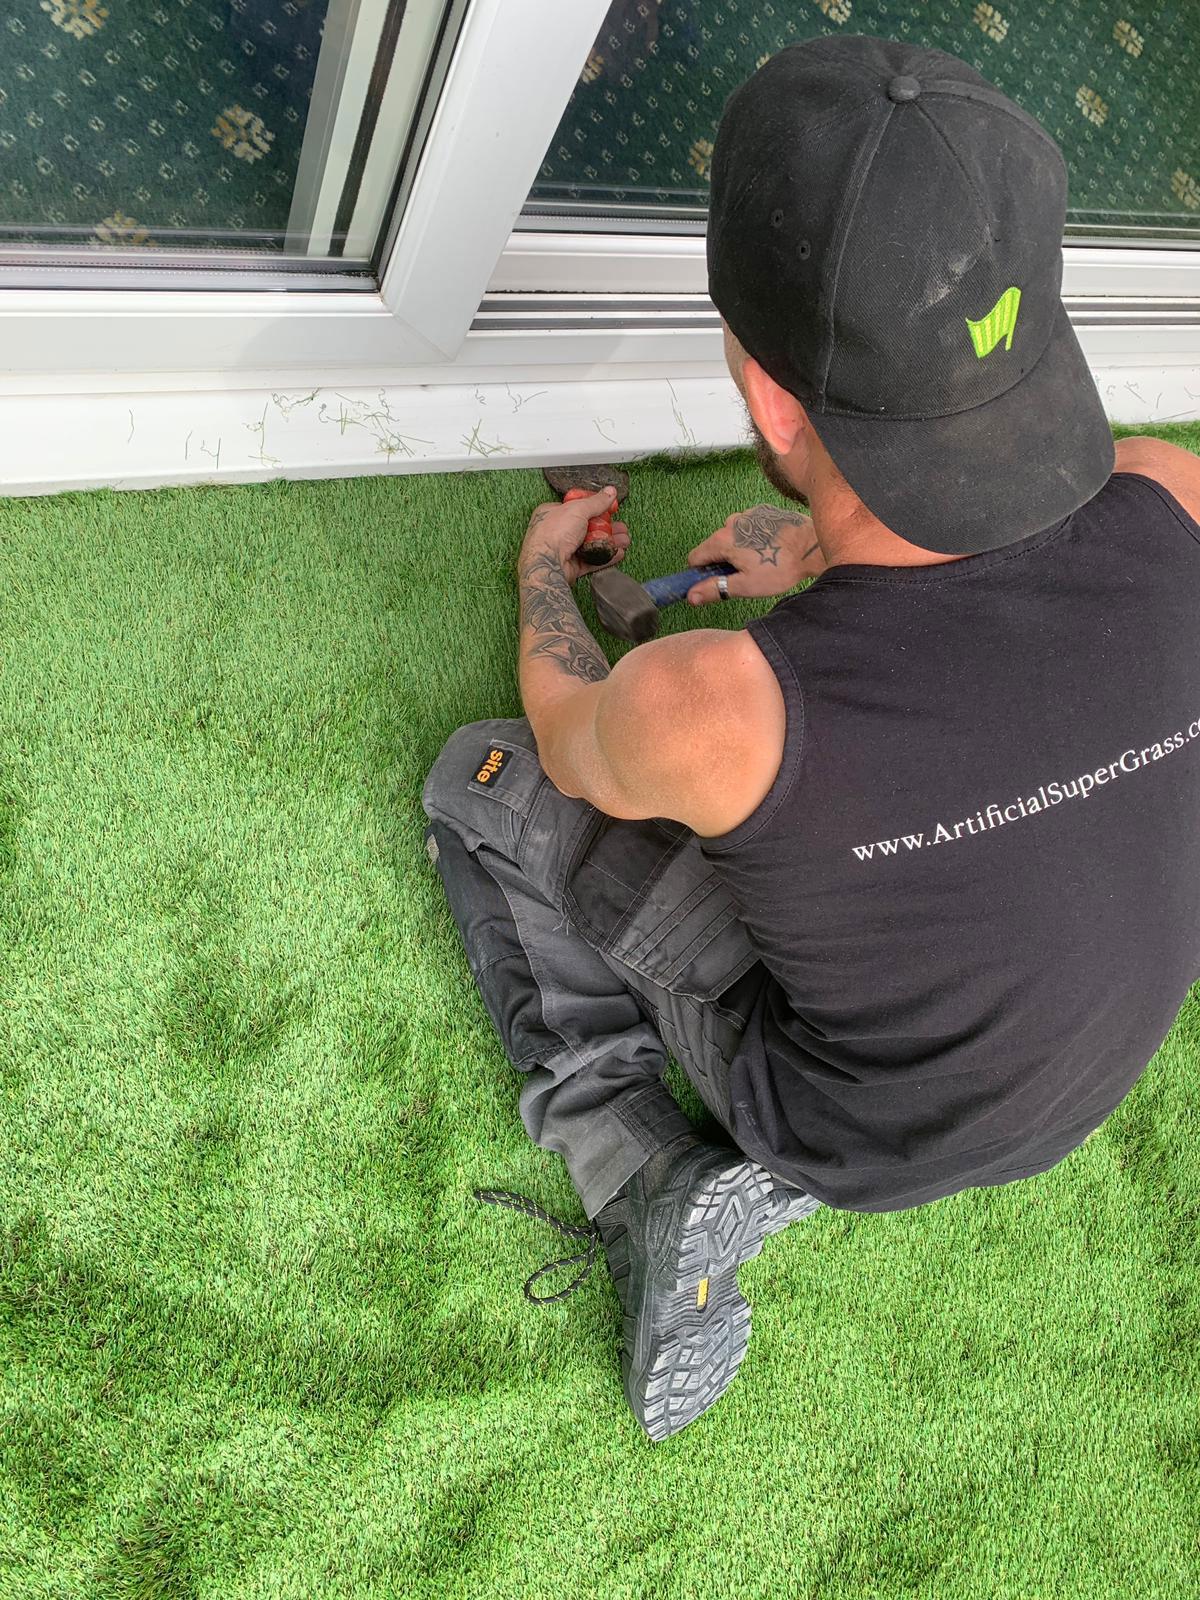 Fake Grass For Dogs Blackburn Artificial Super Grass